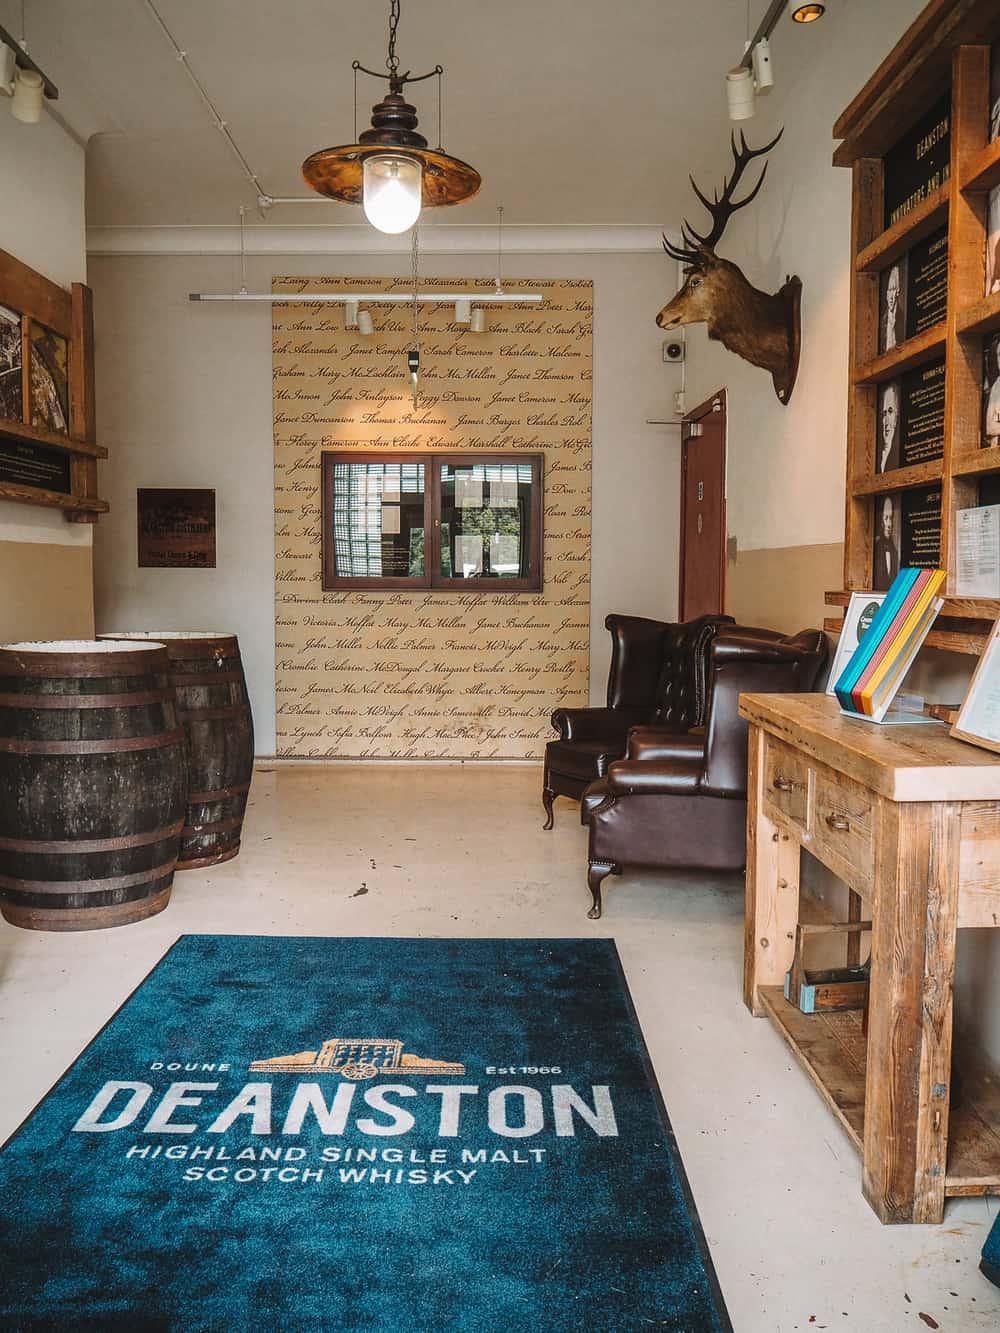 Deanston Distillery Visitor Centre